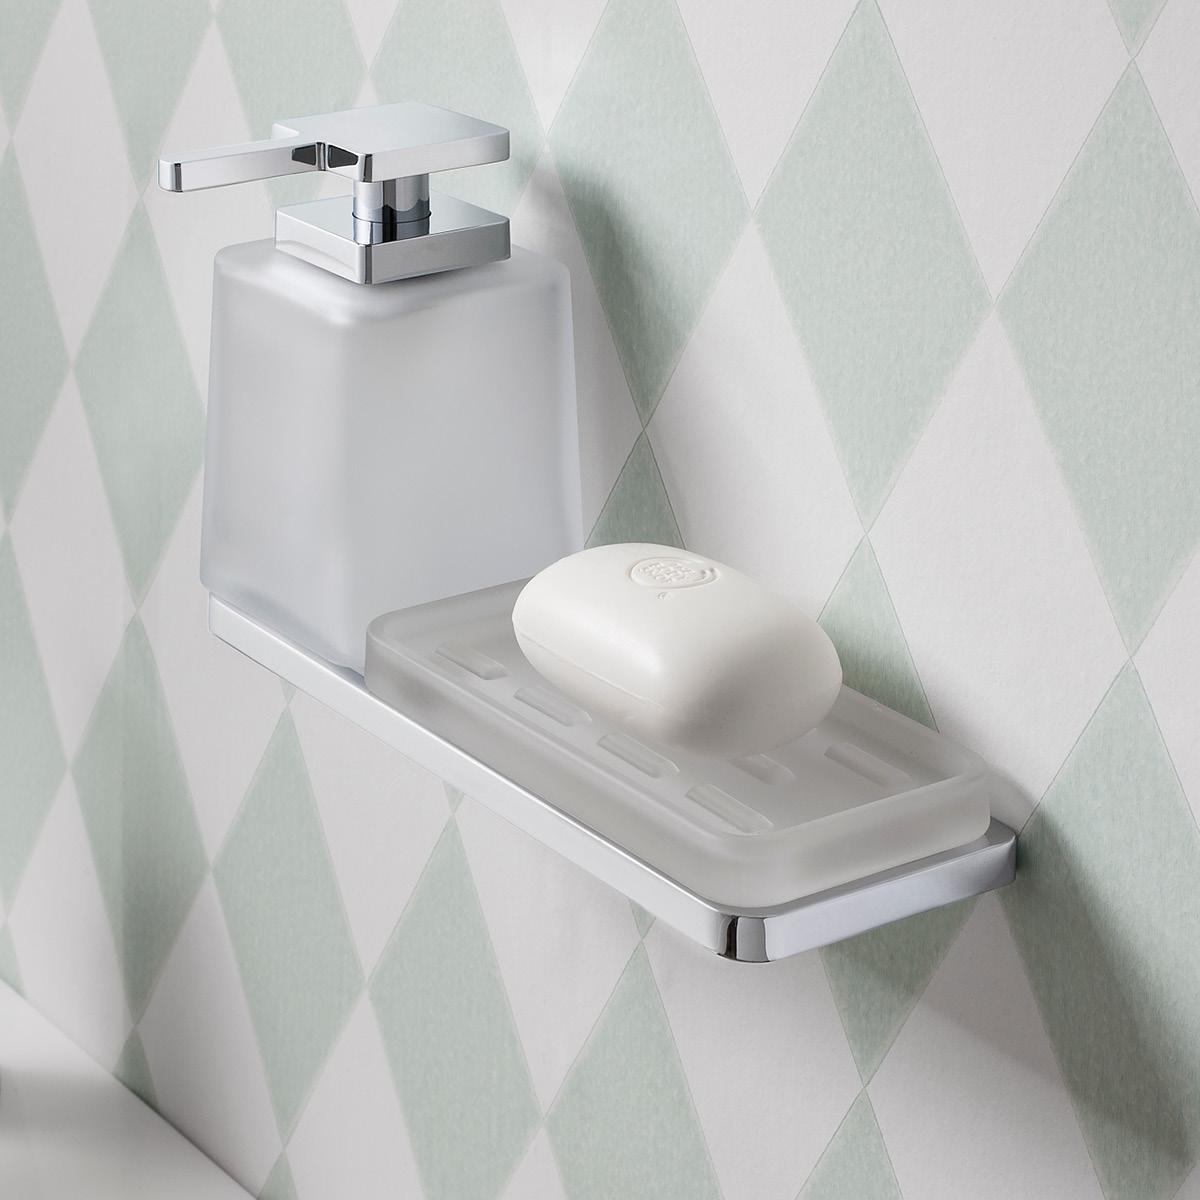 Wisp Soap Holder In Holders Dispensers